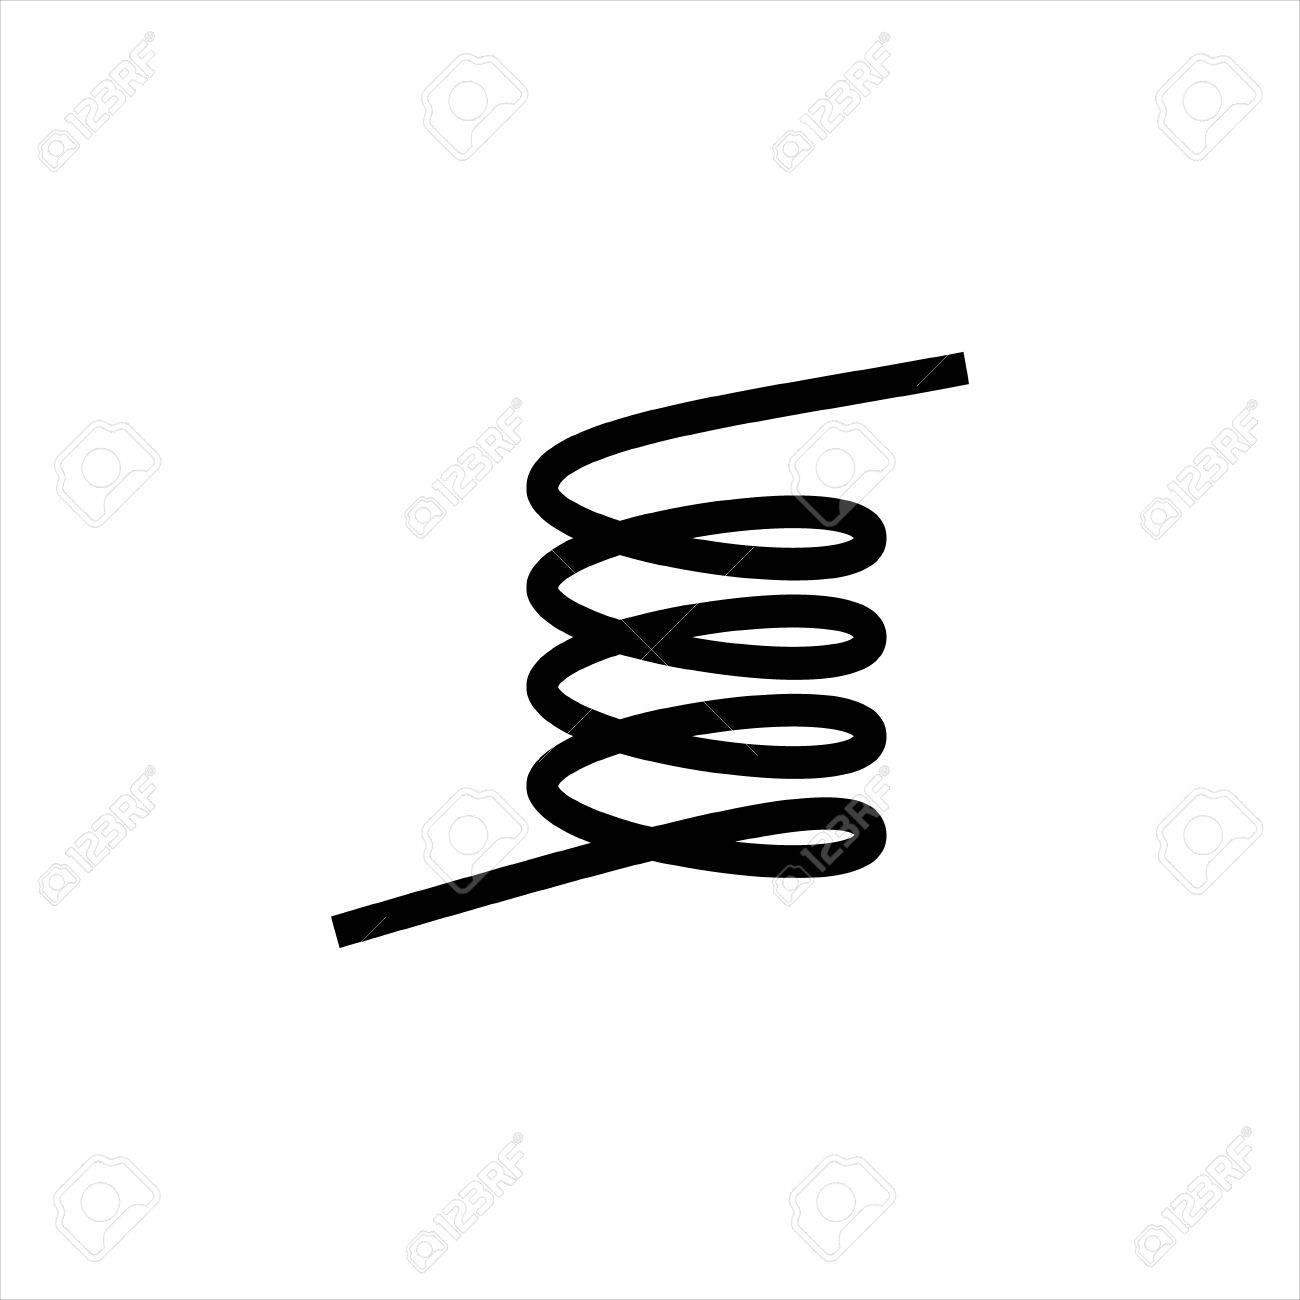 Vektor-Illustration Schwarz Silhouette Der Frühling Symbol Isoliert ...